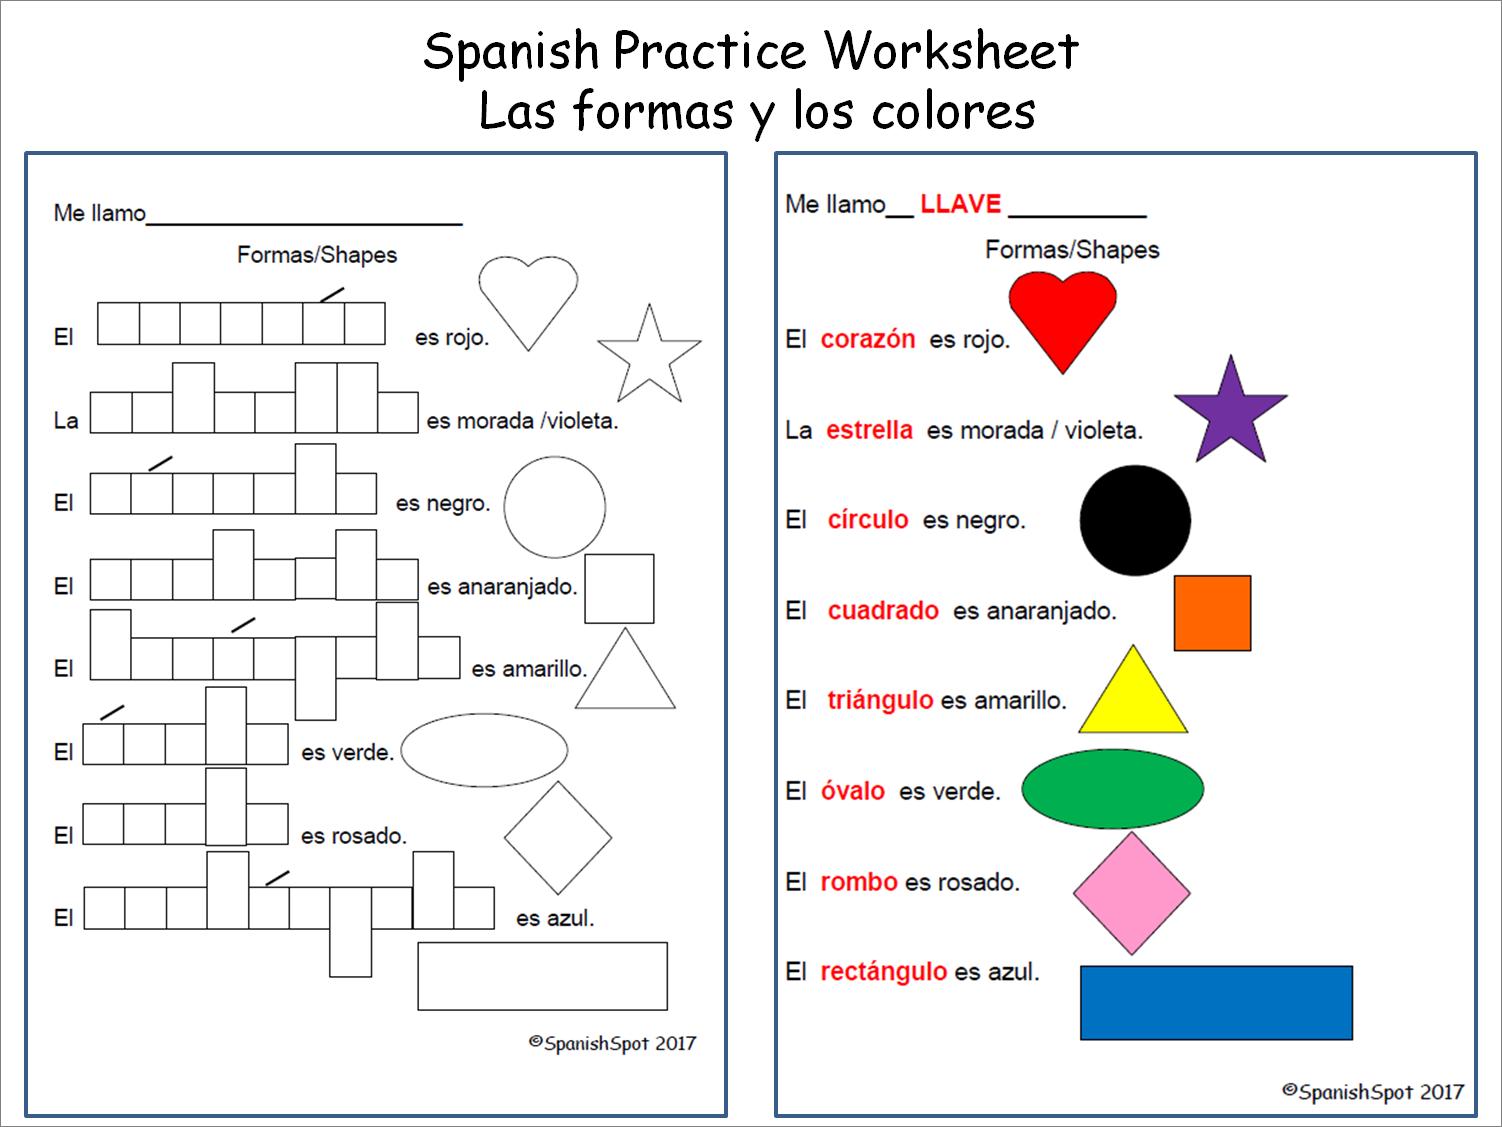 Worksheets Elementary Spanish Worksheets spanish shapes and colors worksheet worksheets elementary spanish